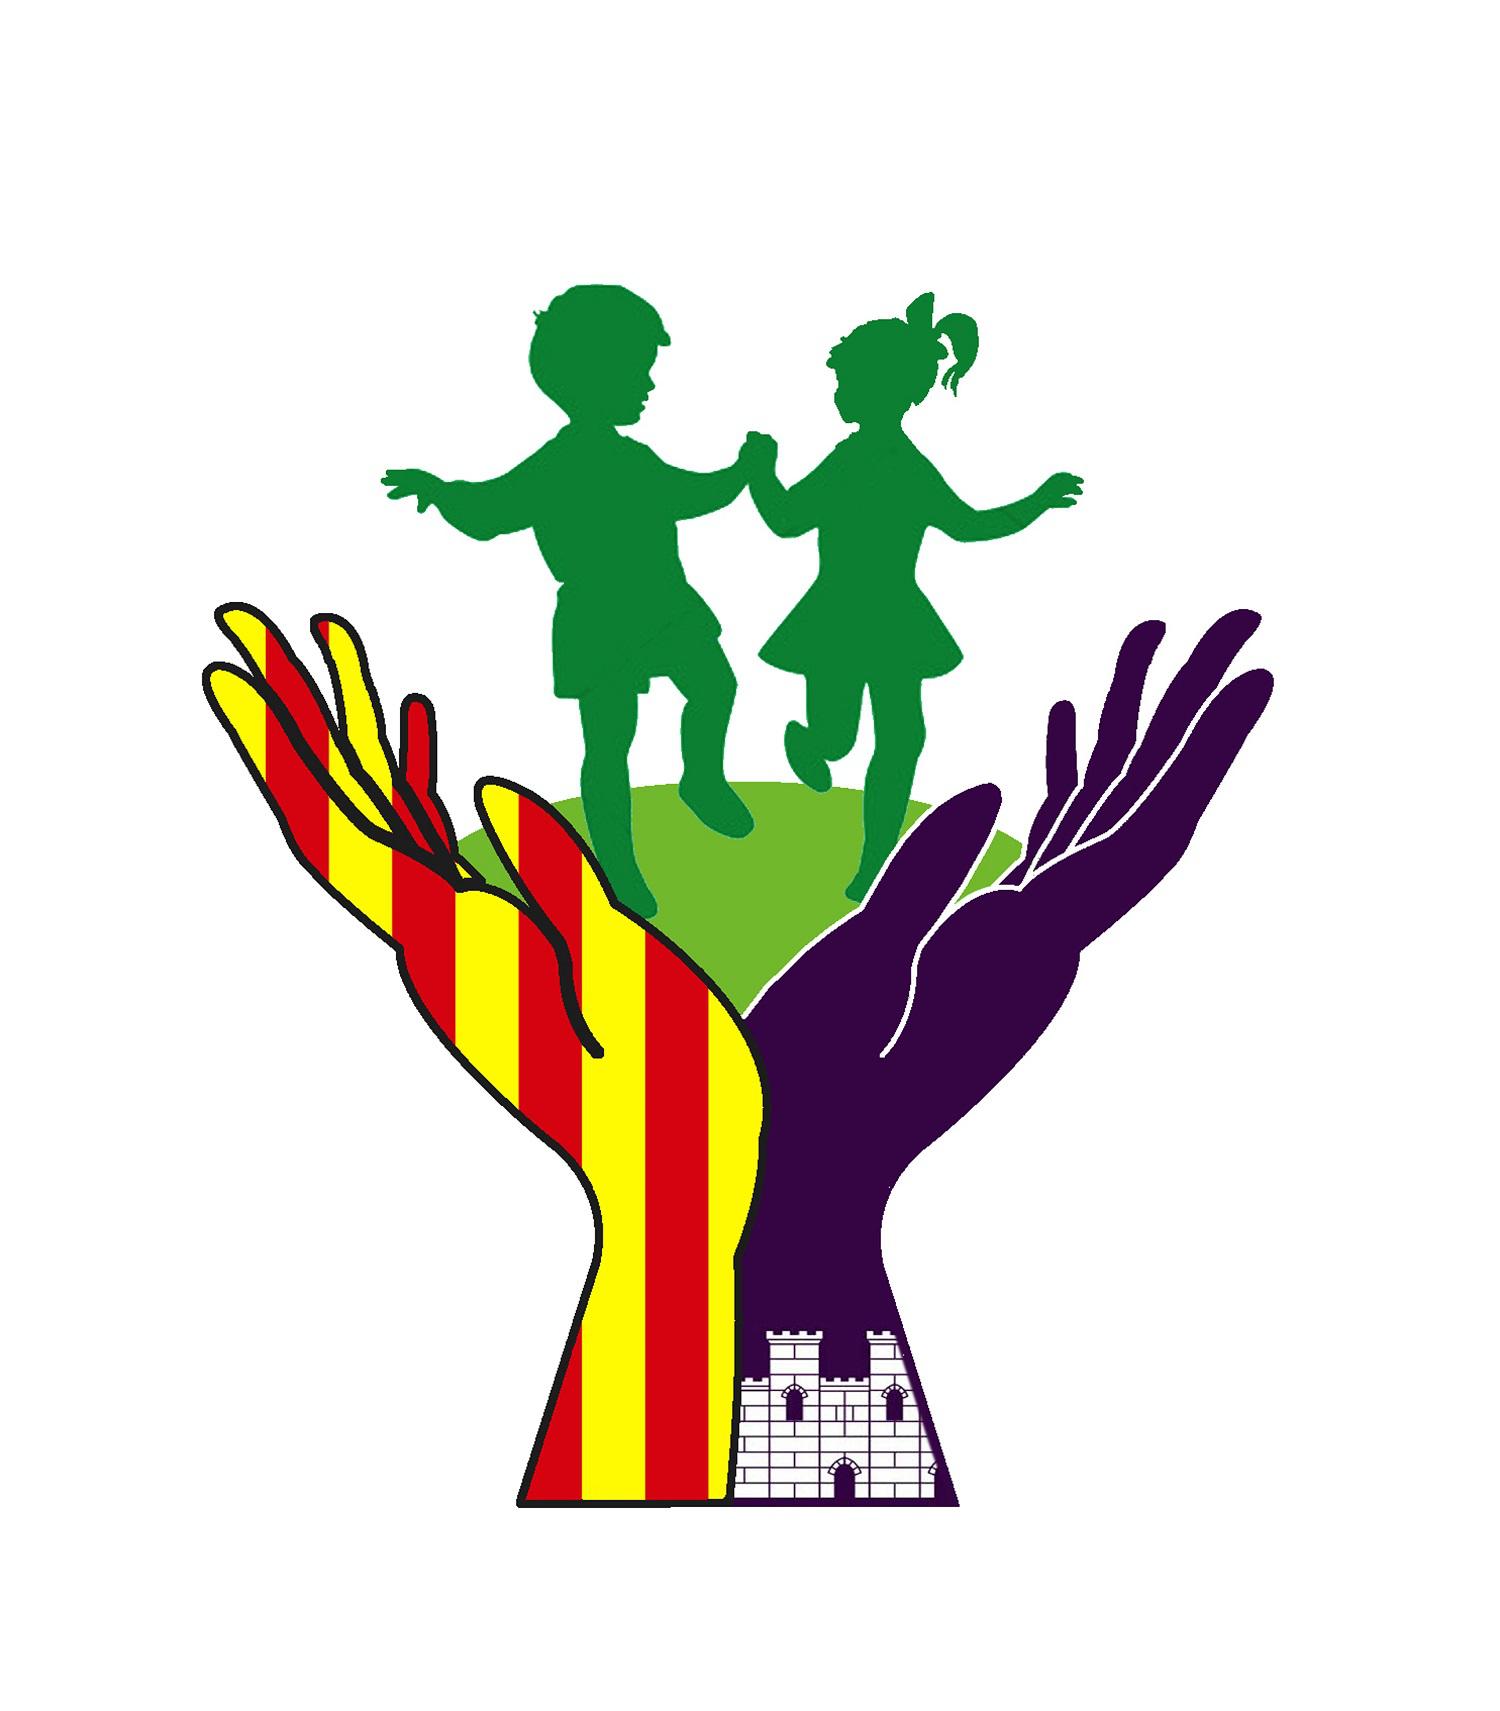 Collaboration clipart civil partnership. Partners joyronfoundation org joyronfoundationorg